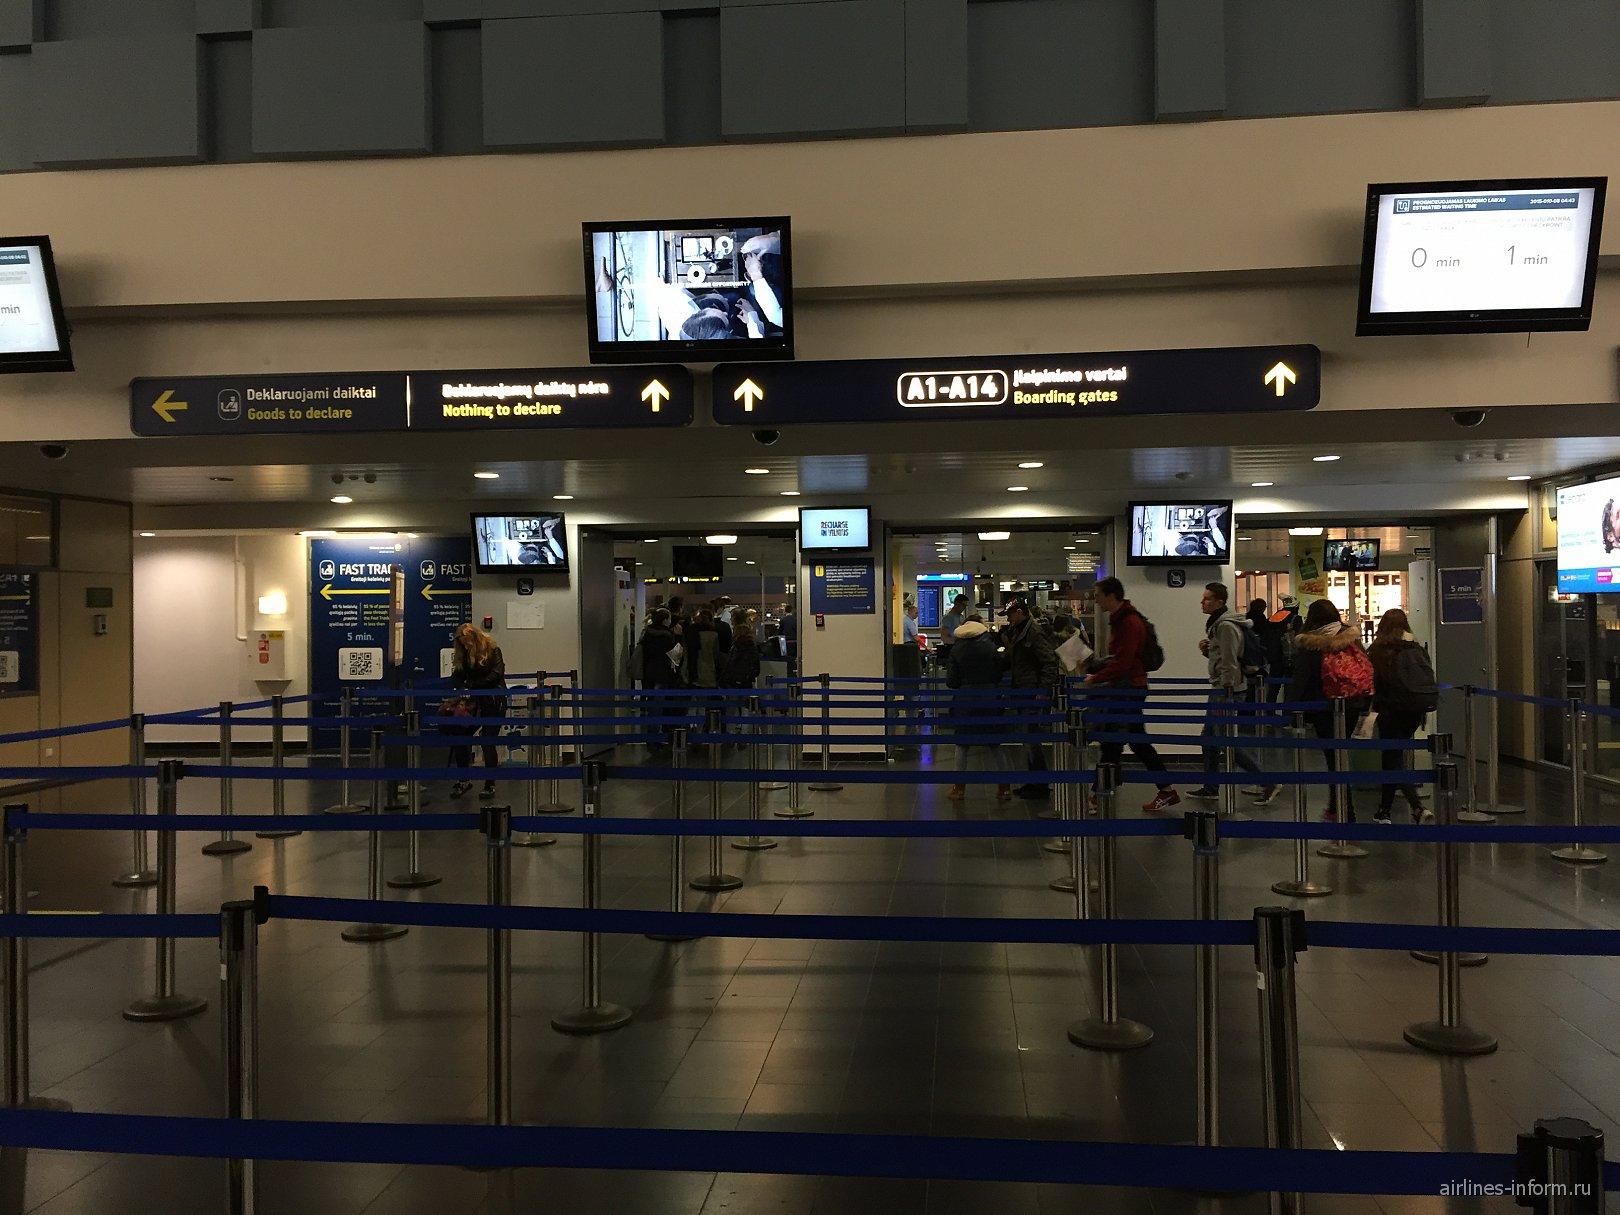 Зона досмотра в аэропорту Вильнюс